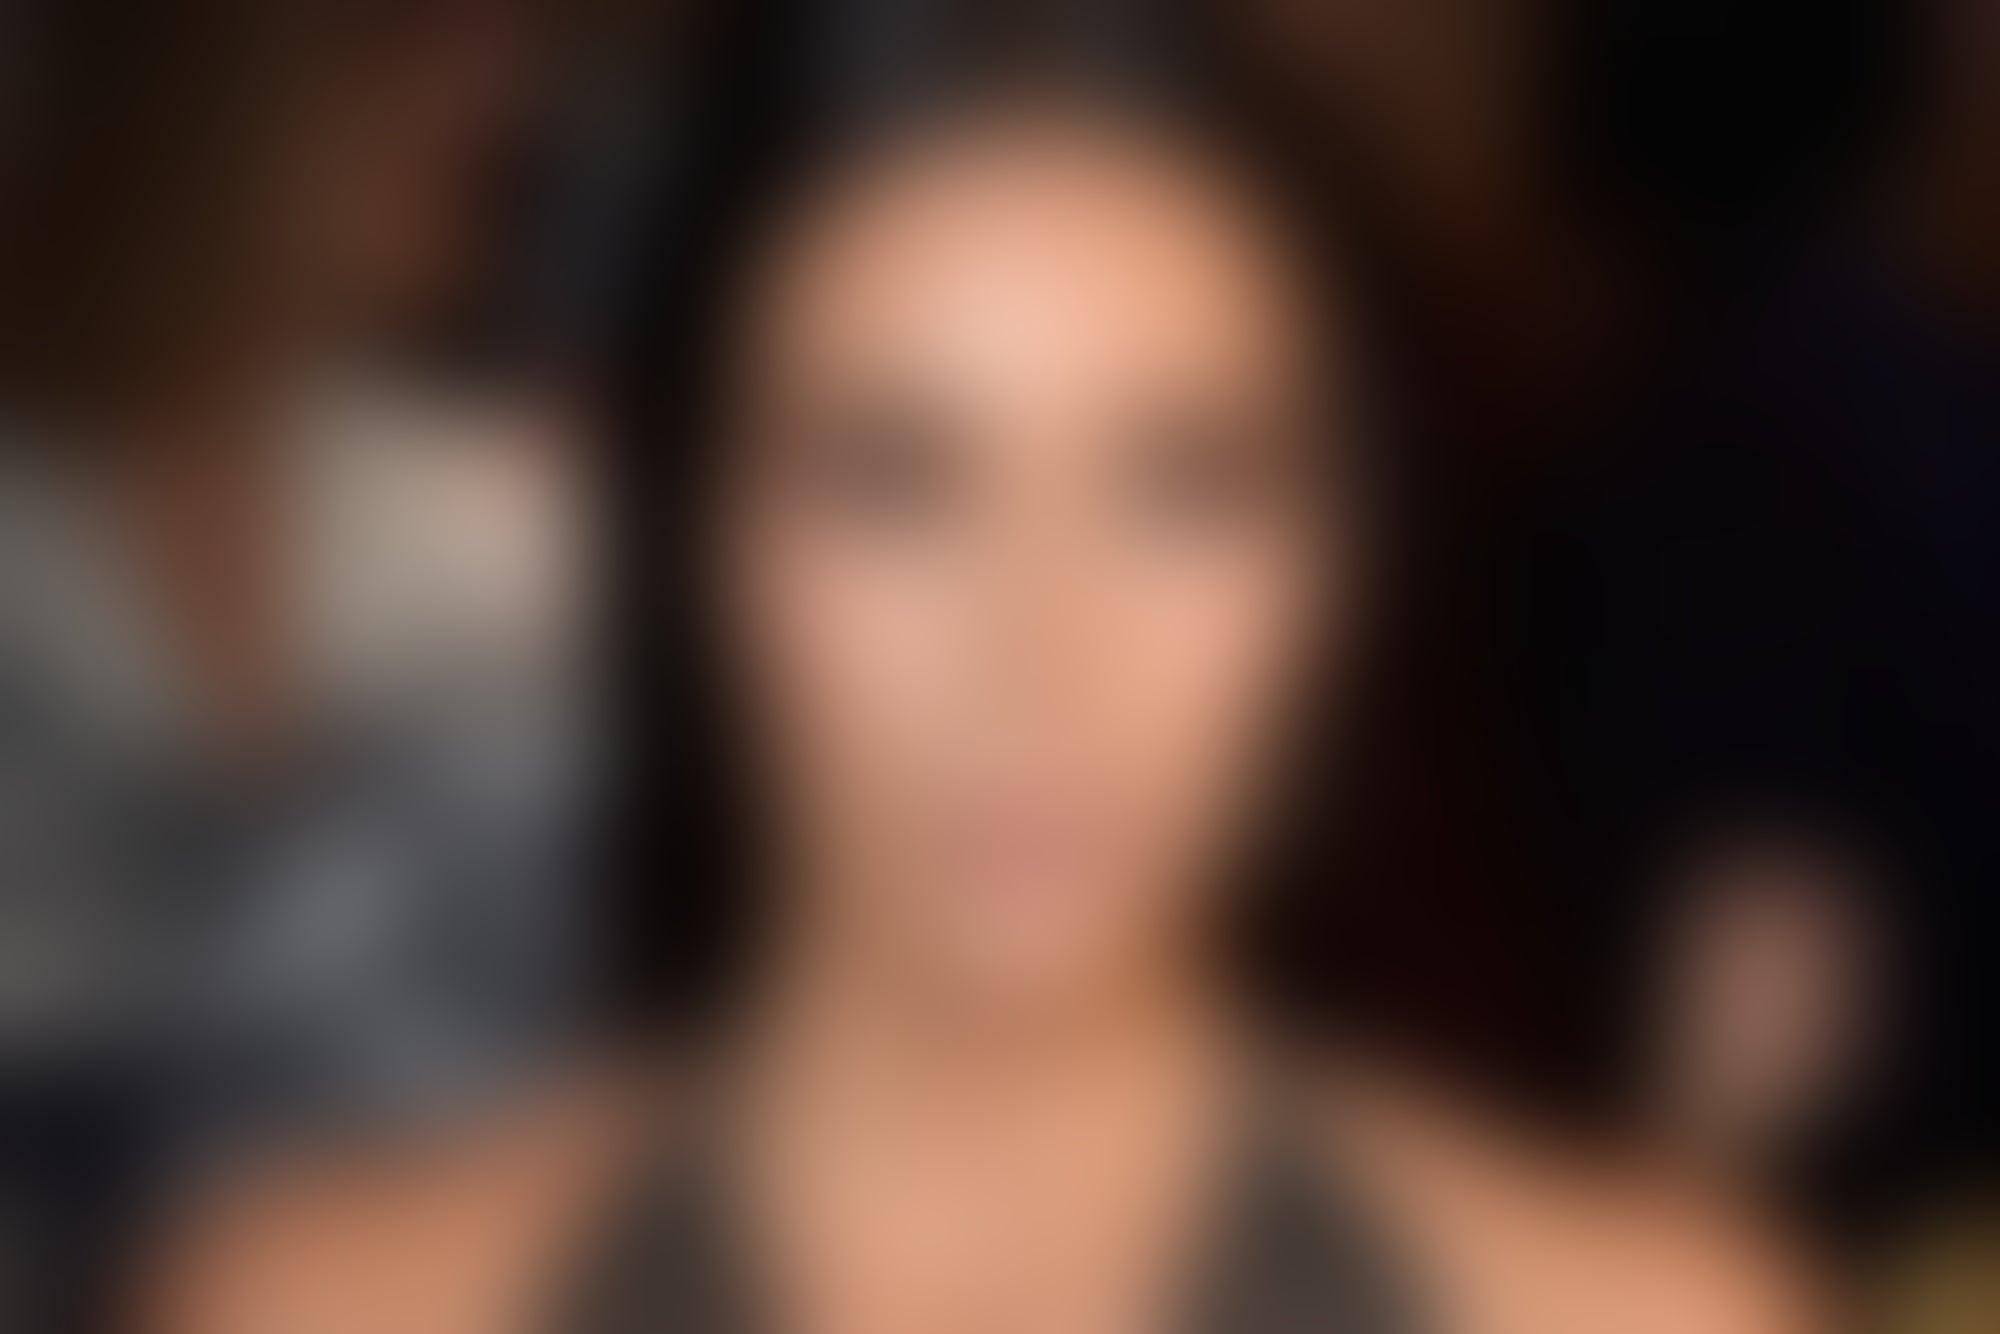 Kim Kardashian West Held at Gunpoint in $10 Million Robbery During Paris Fashion Week